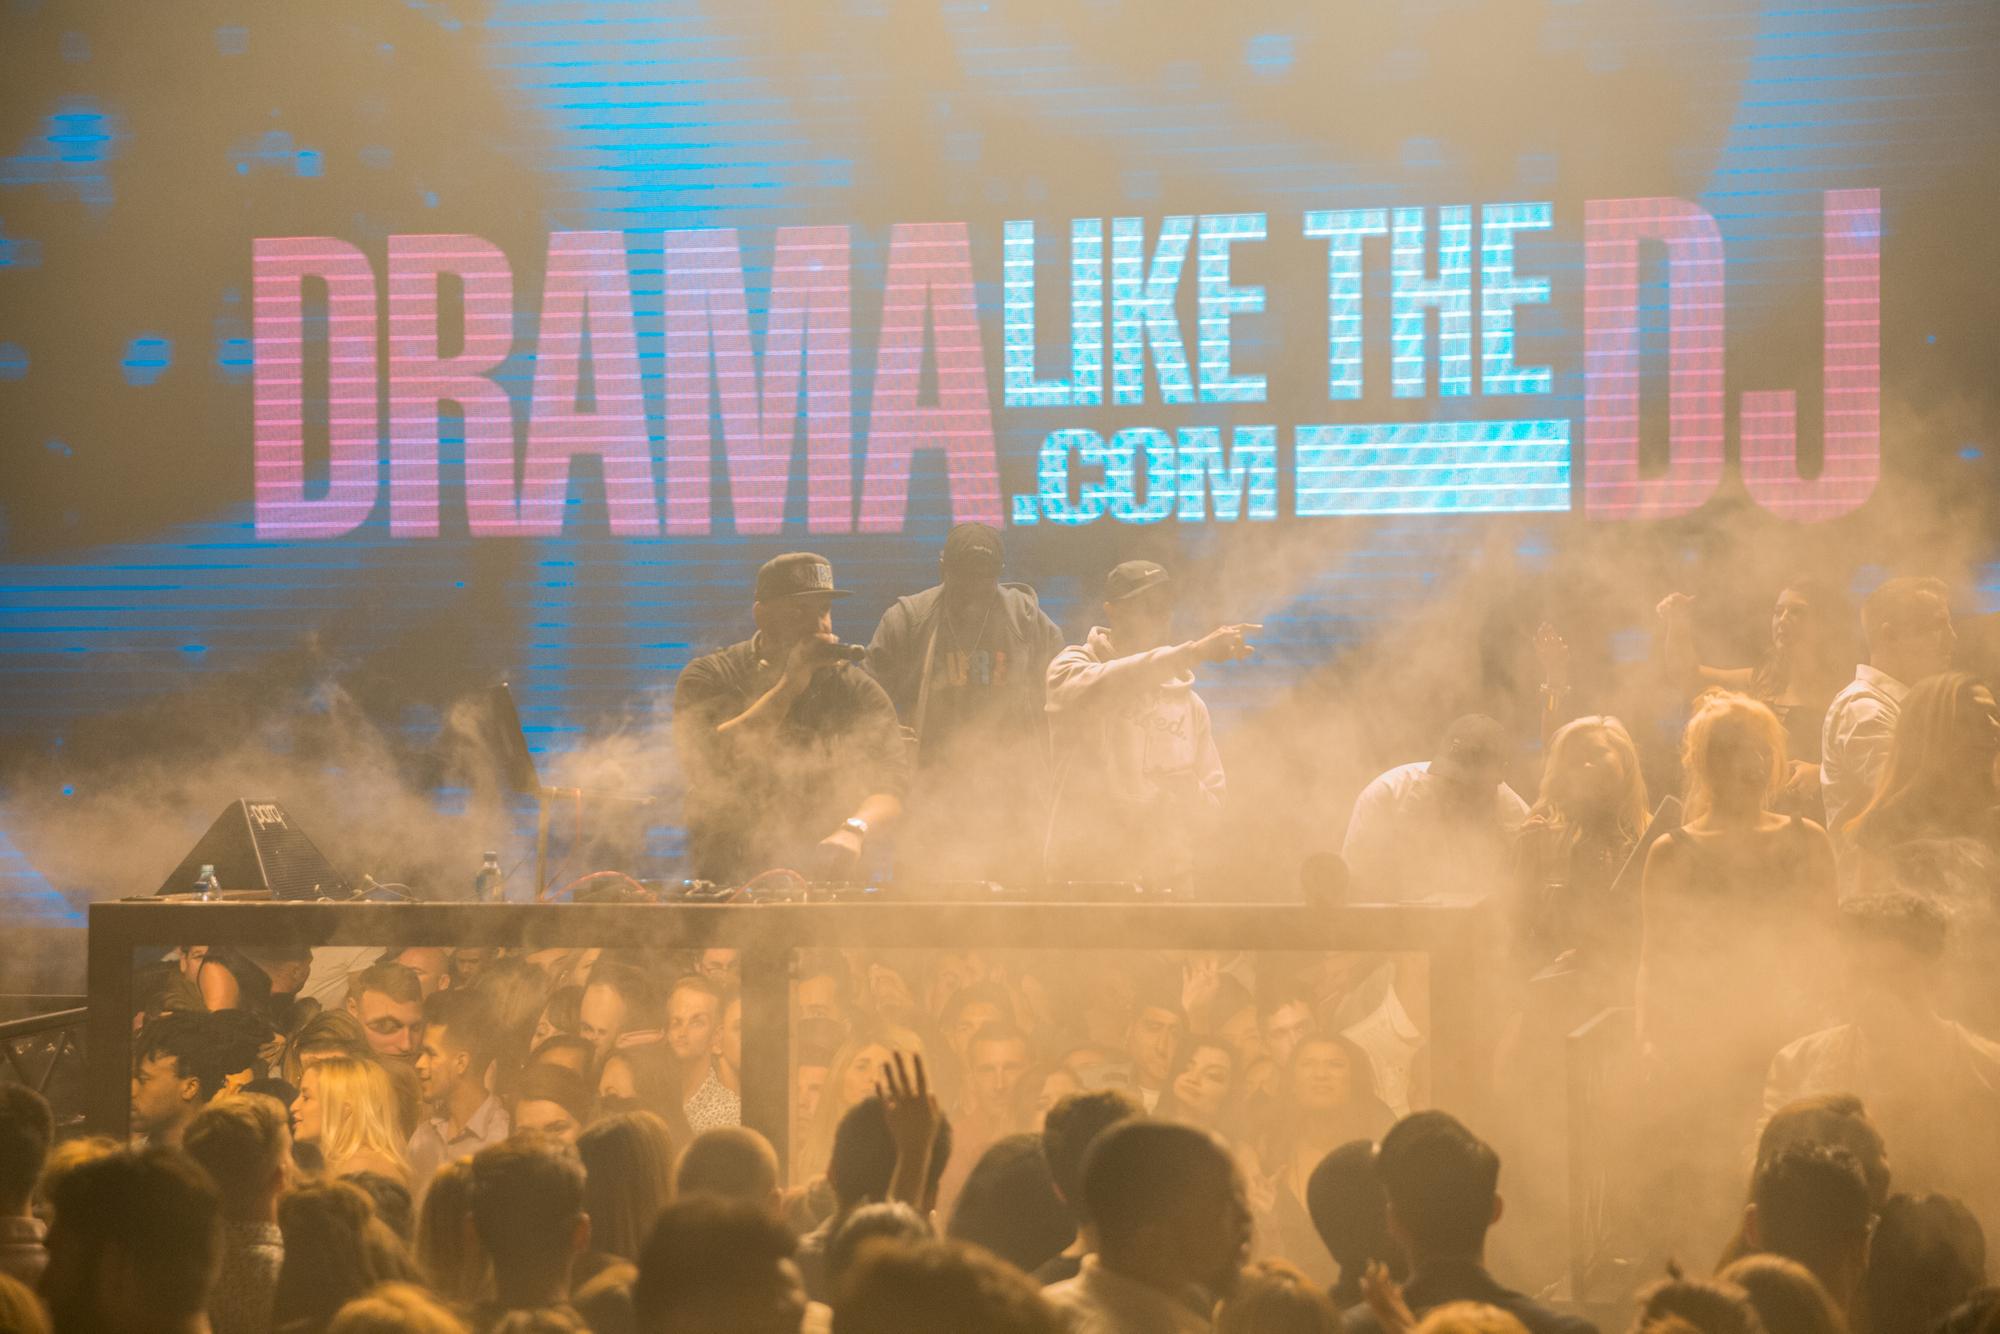 02.18.18 Parq - DJ Drama--1.jpg